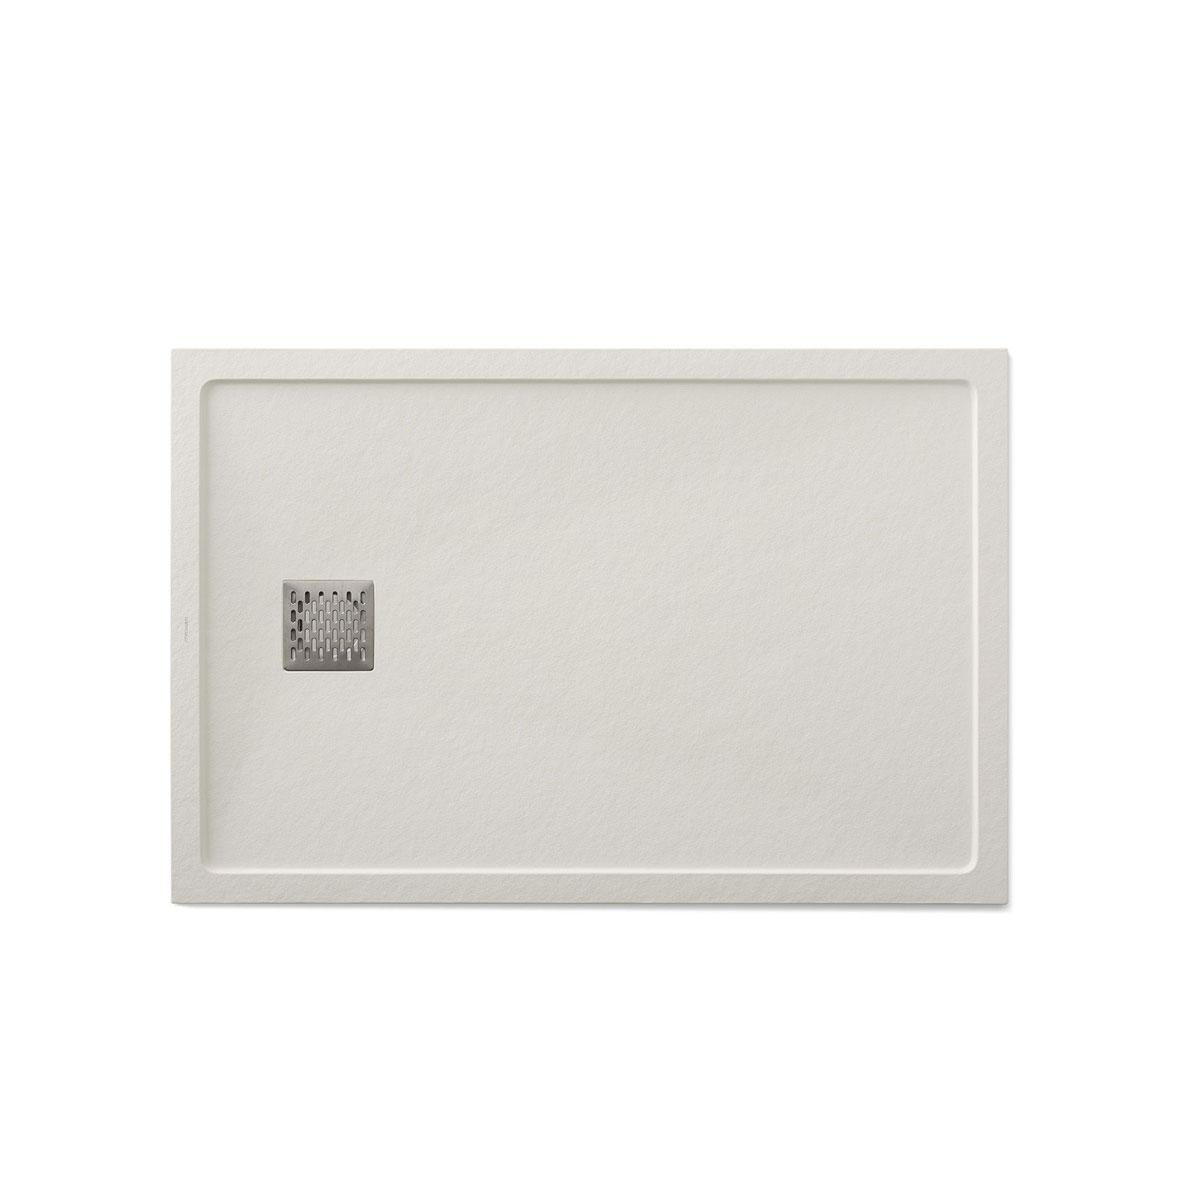 Plato de ducha rectangular 120x80 Ares Stone Nox Marfil